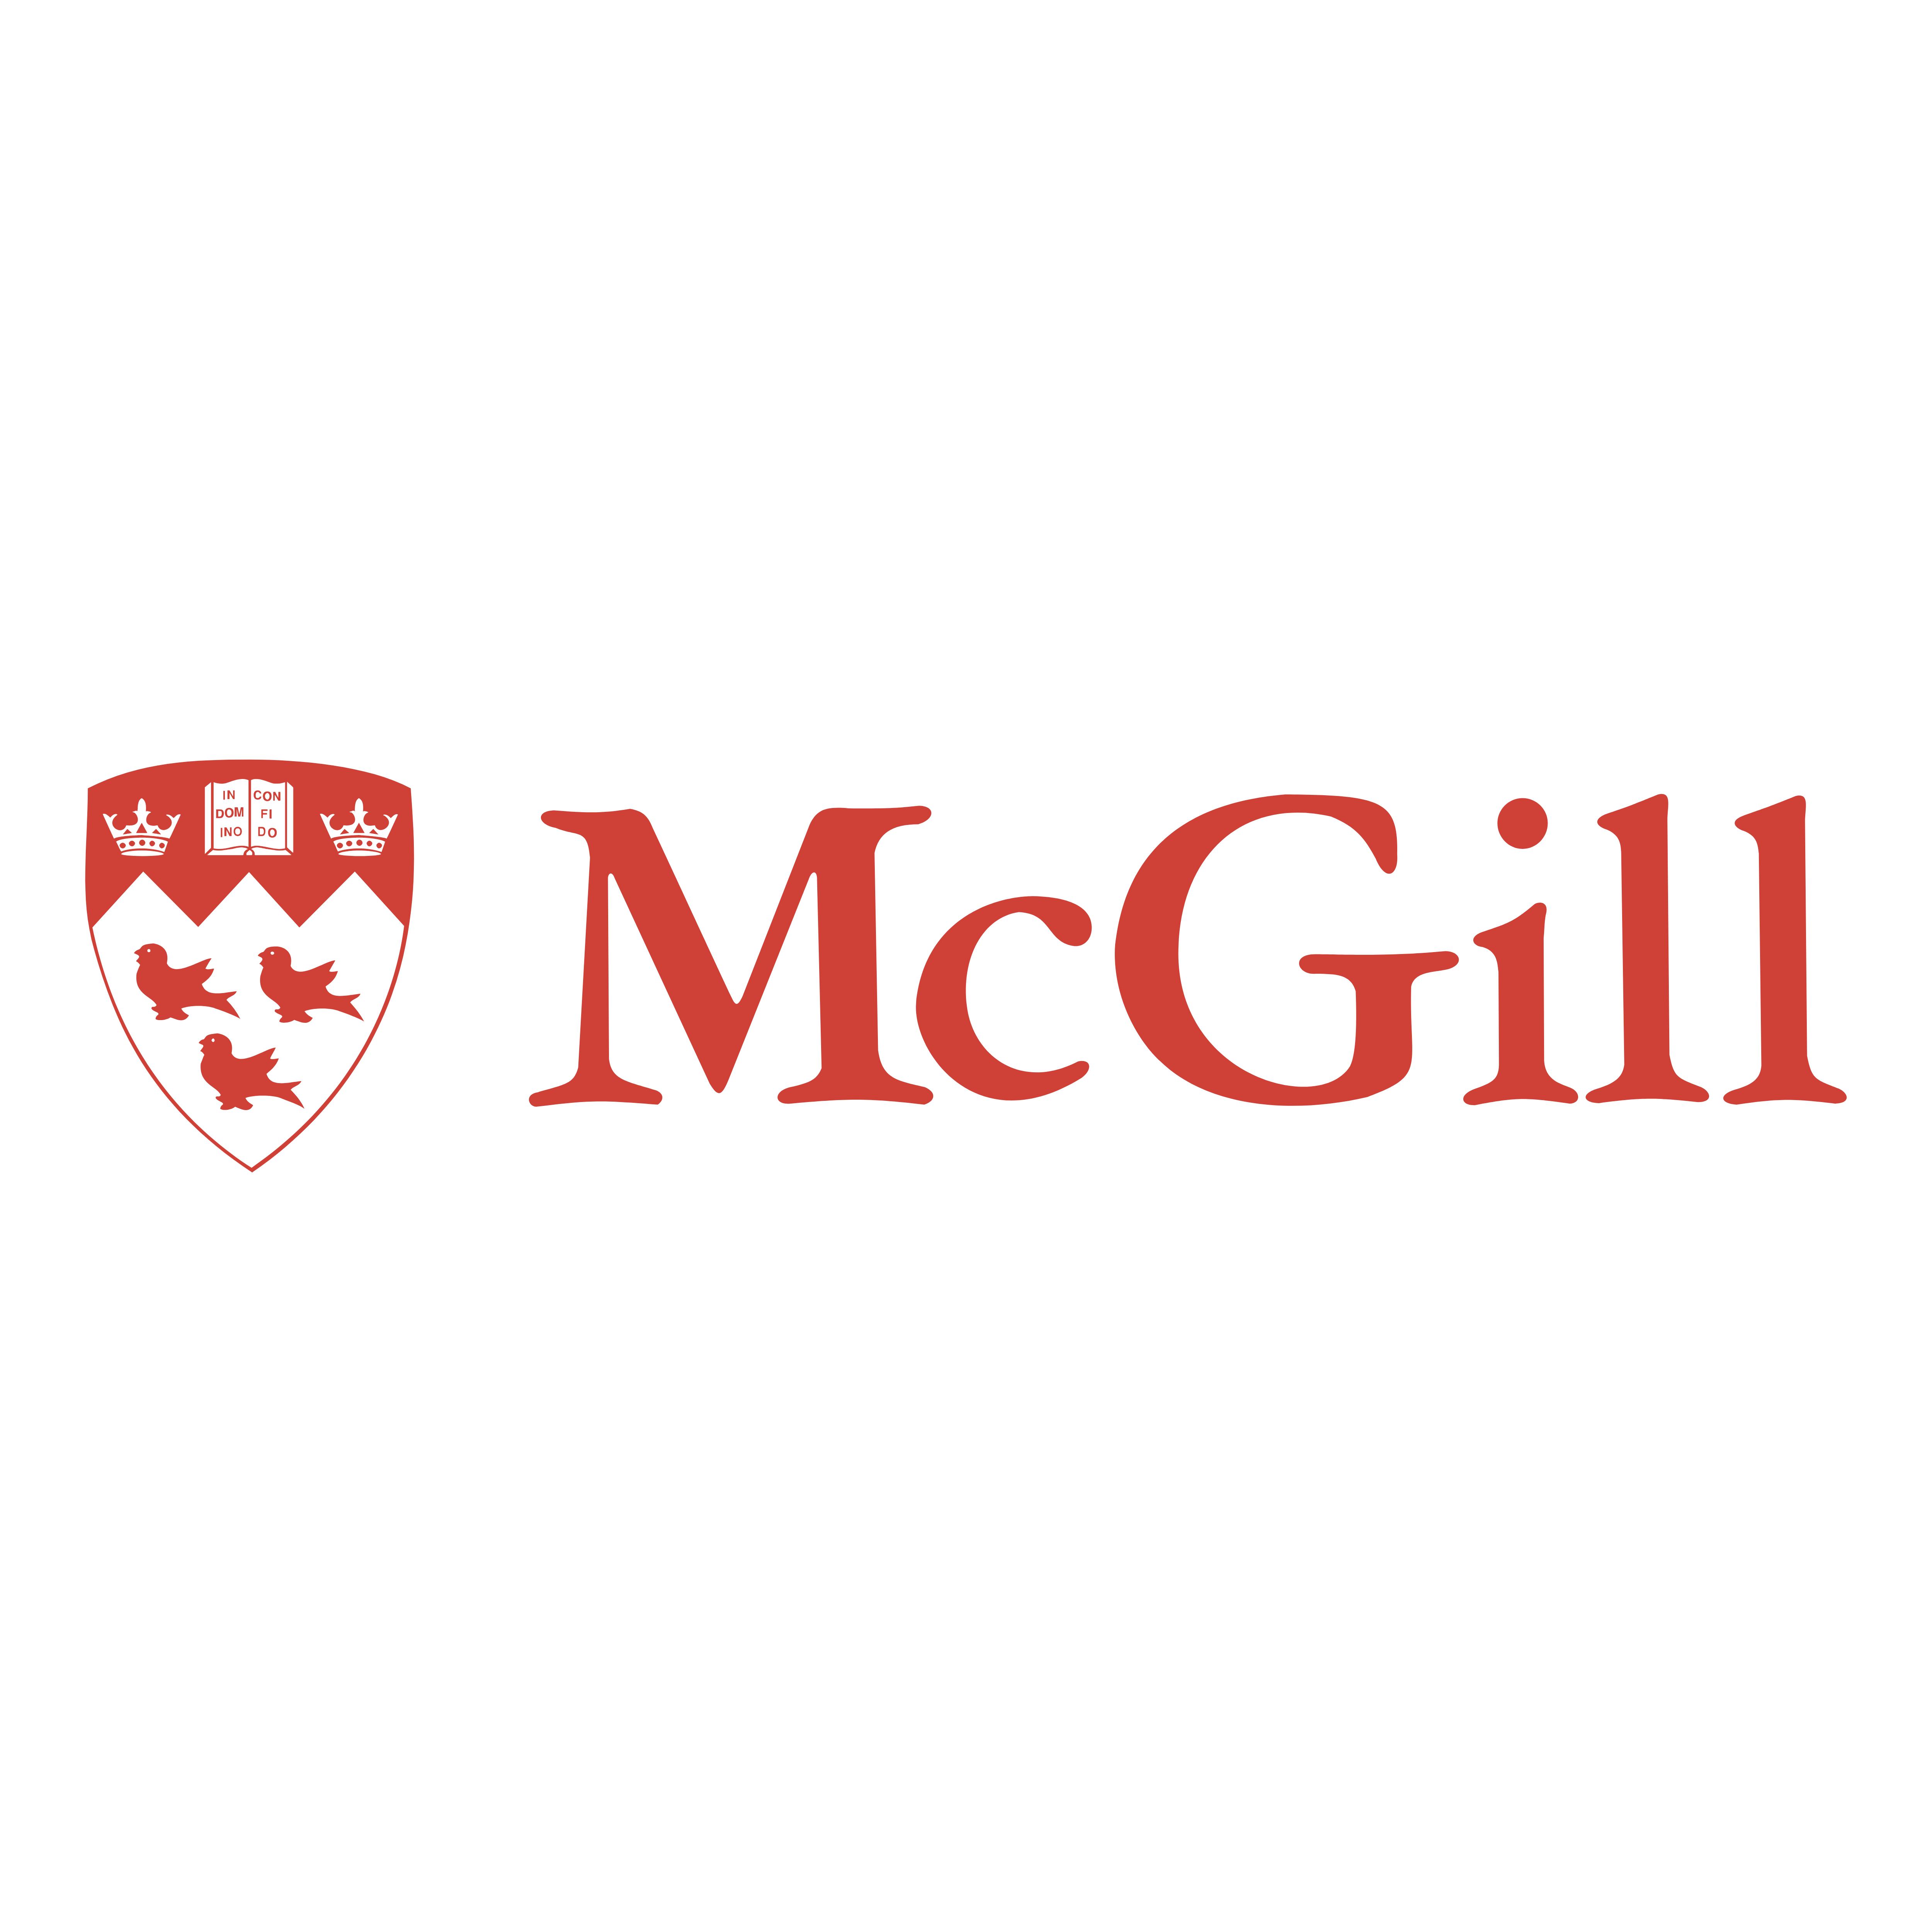 mcgill university � logos download